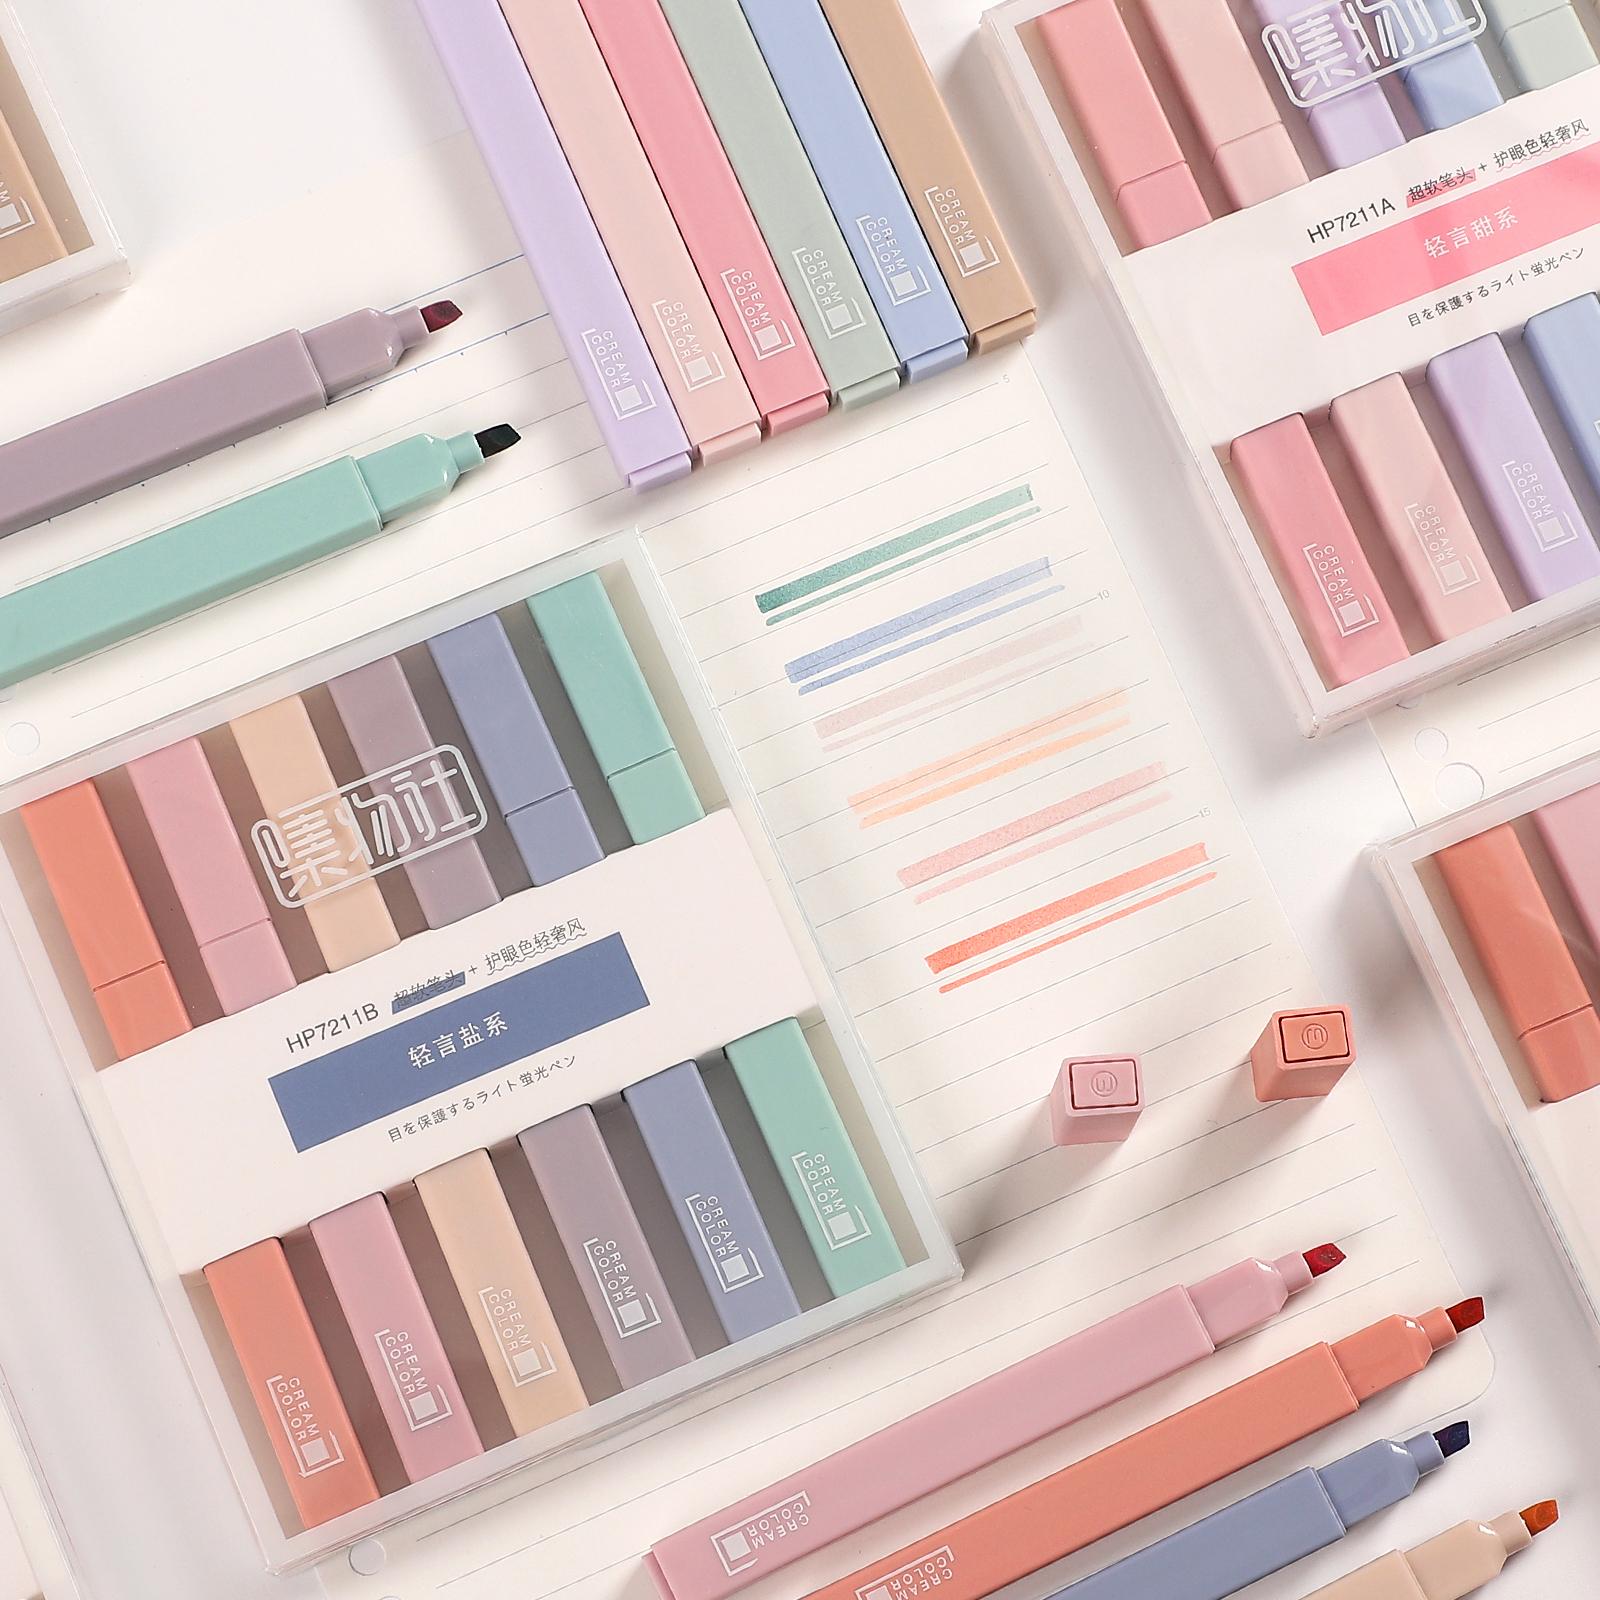 JIANWU 6pcs/set Soft Tip Highlighter Light Color Kawaii Marker Pen DIY Photo Album Journal Fluorescent Pen Student Stationery